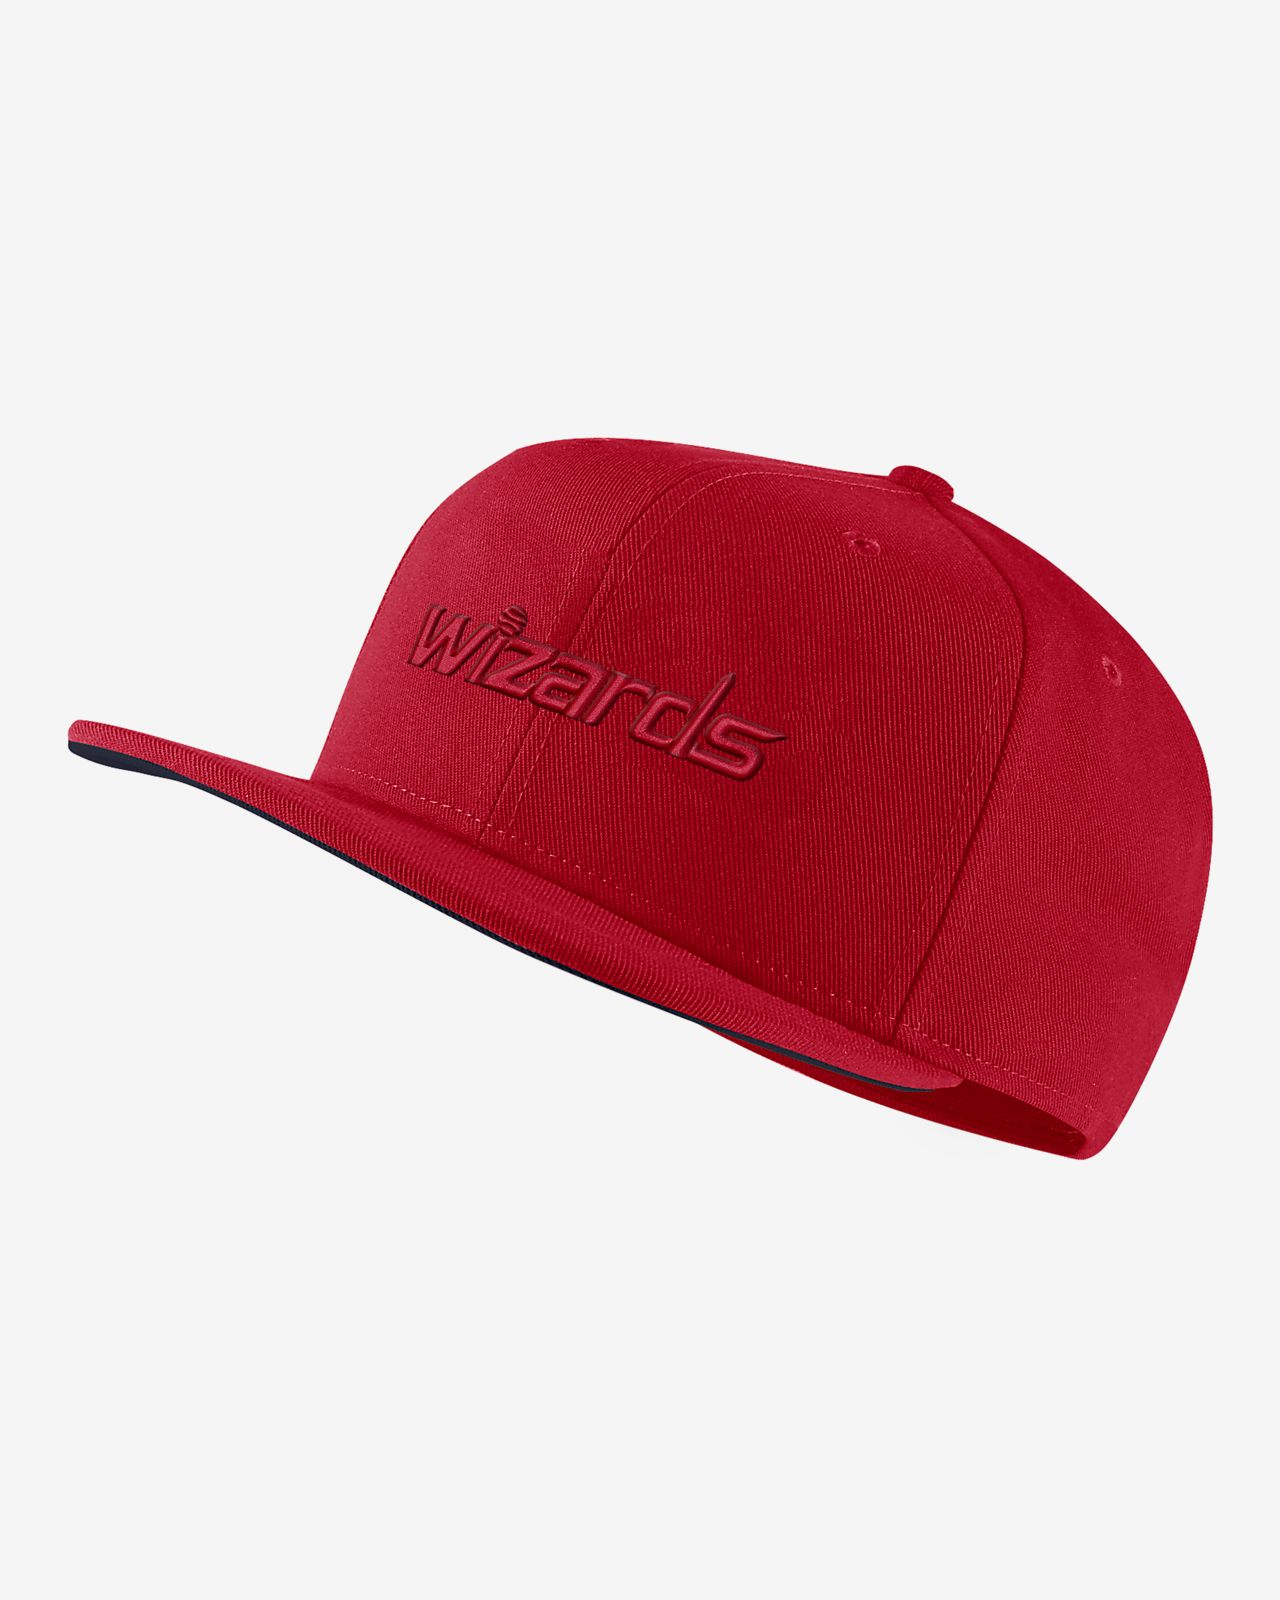 NBA-keps Washington Wizards Nike AeroBill